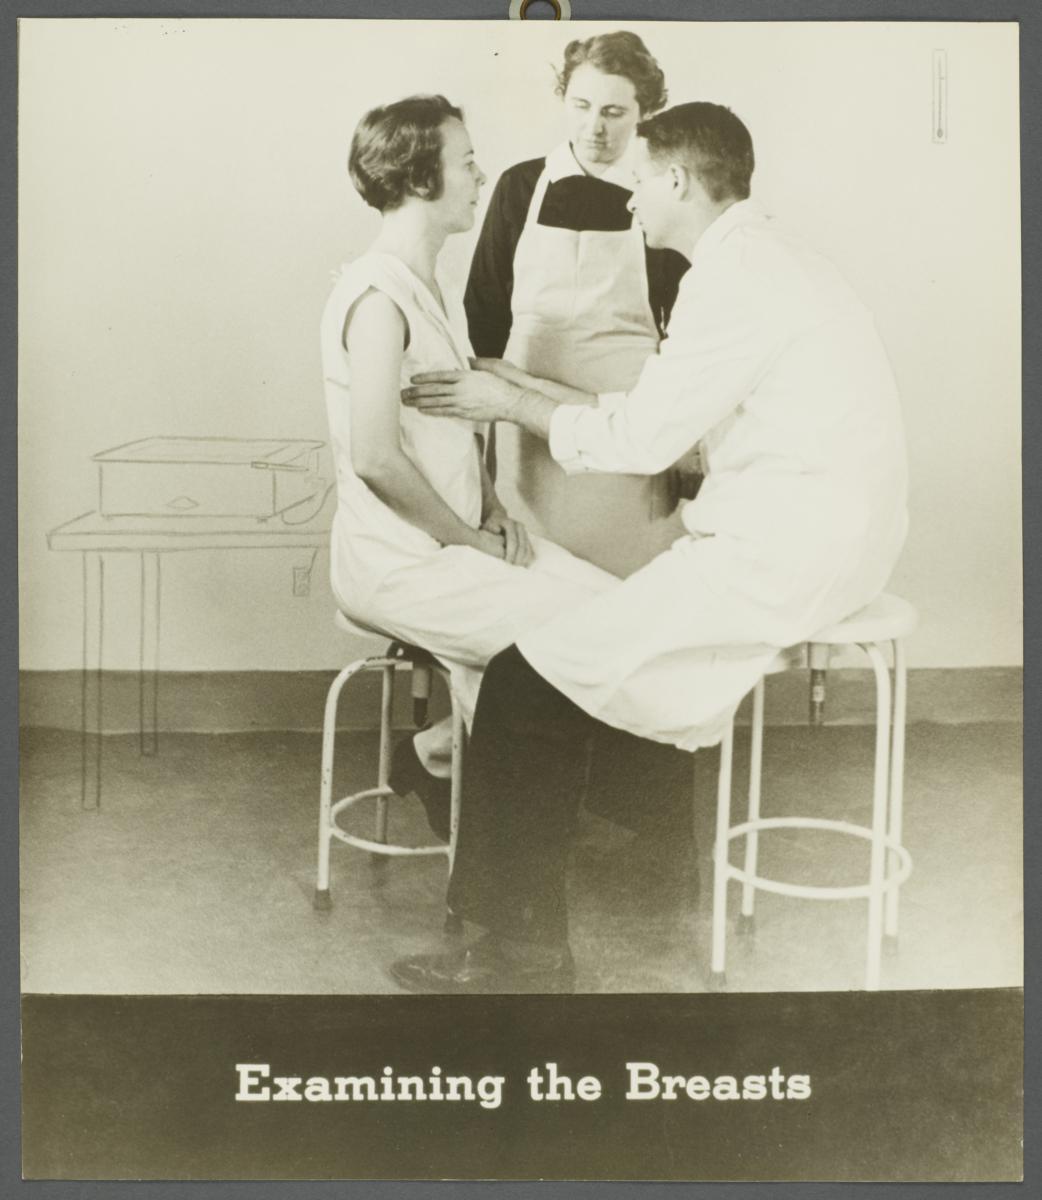 Women's Health Examination Portfolio -- Examining the Breasts